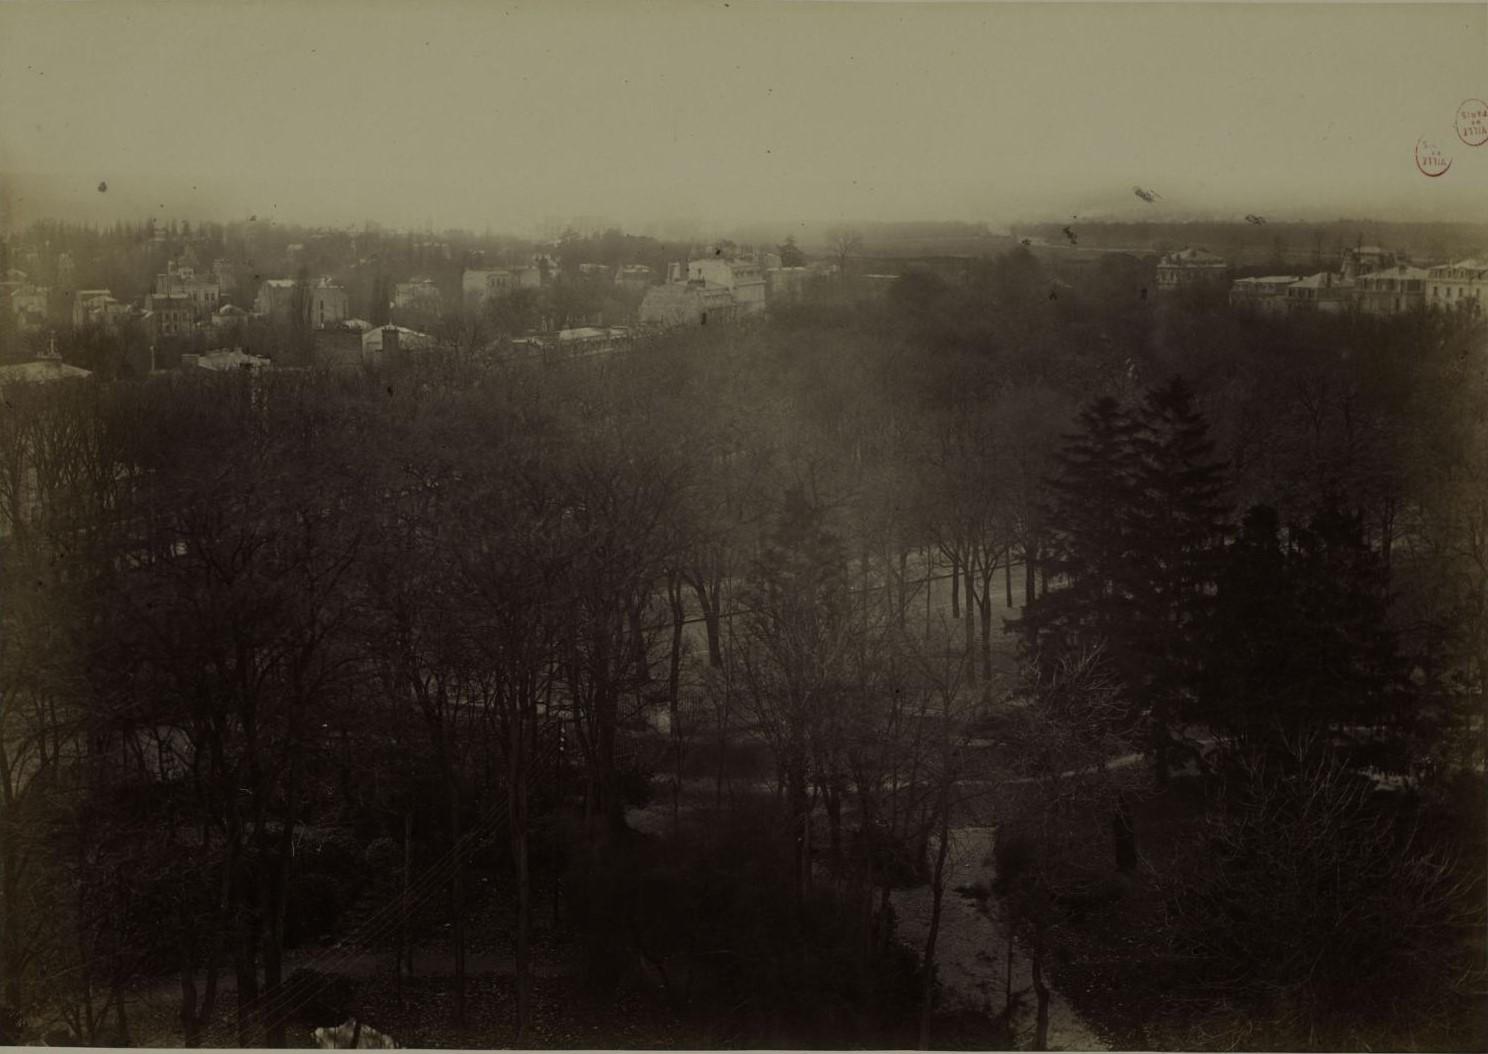 Снимки из Шато де ла Мюетт, XVI округ, 24 - 26 ноября. Городской пейзаж. Направление: Улица Ранелаг, парк Бримборион, Севр, парк Сен-Клу, Гарш